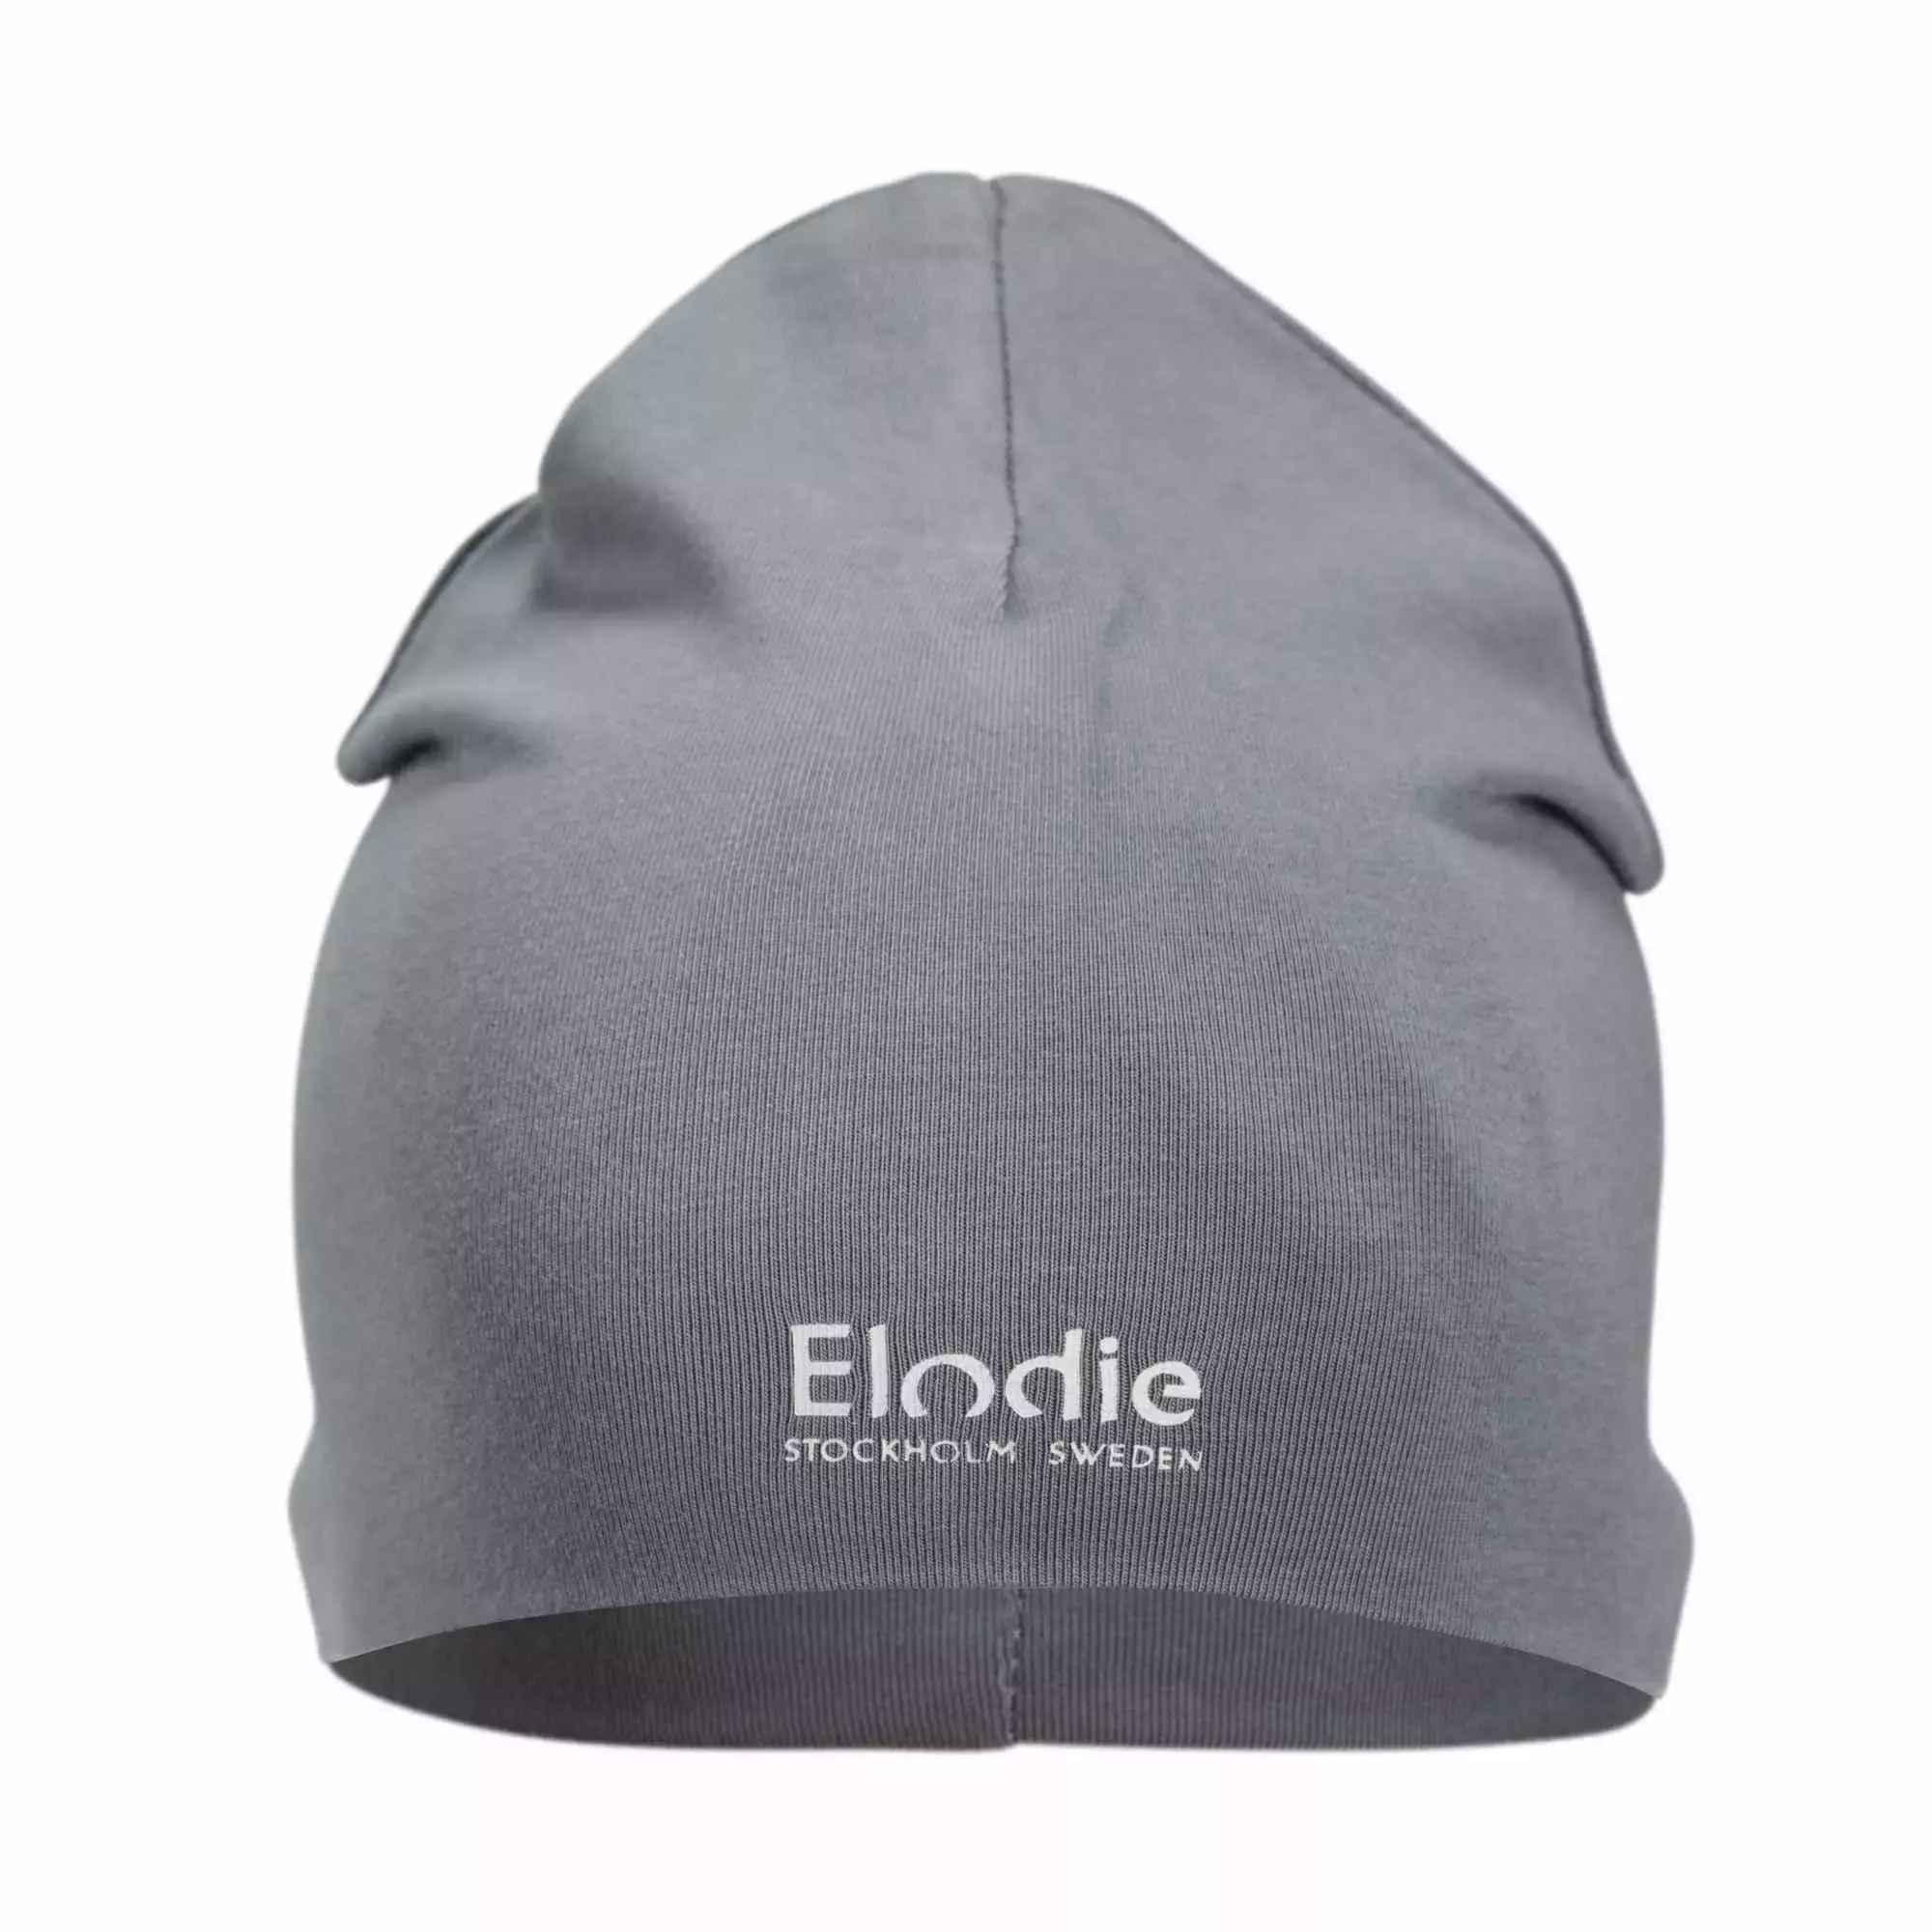 Elodie Details - Czapka - Tender Blue 6-12 m-cy